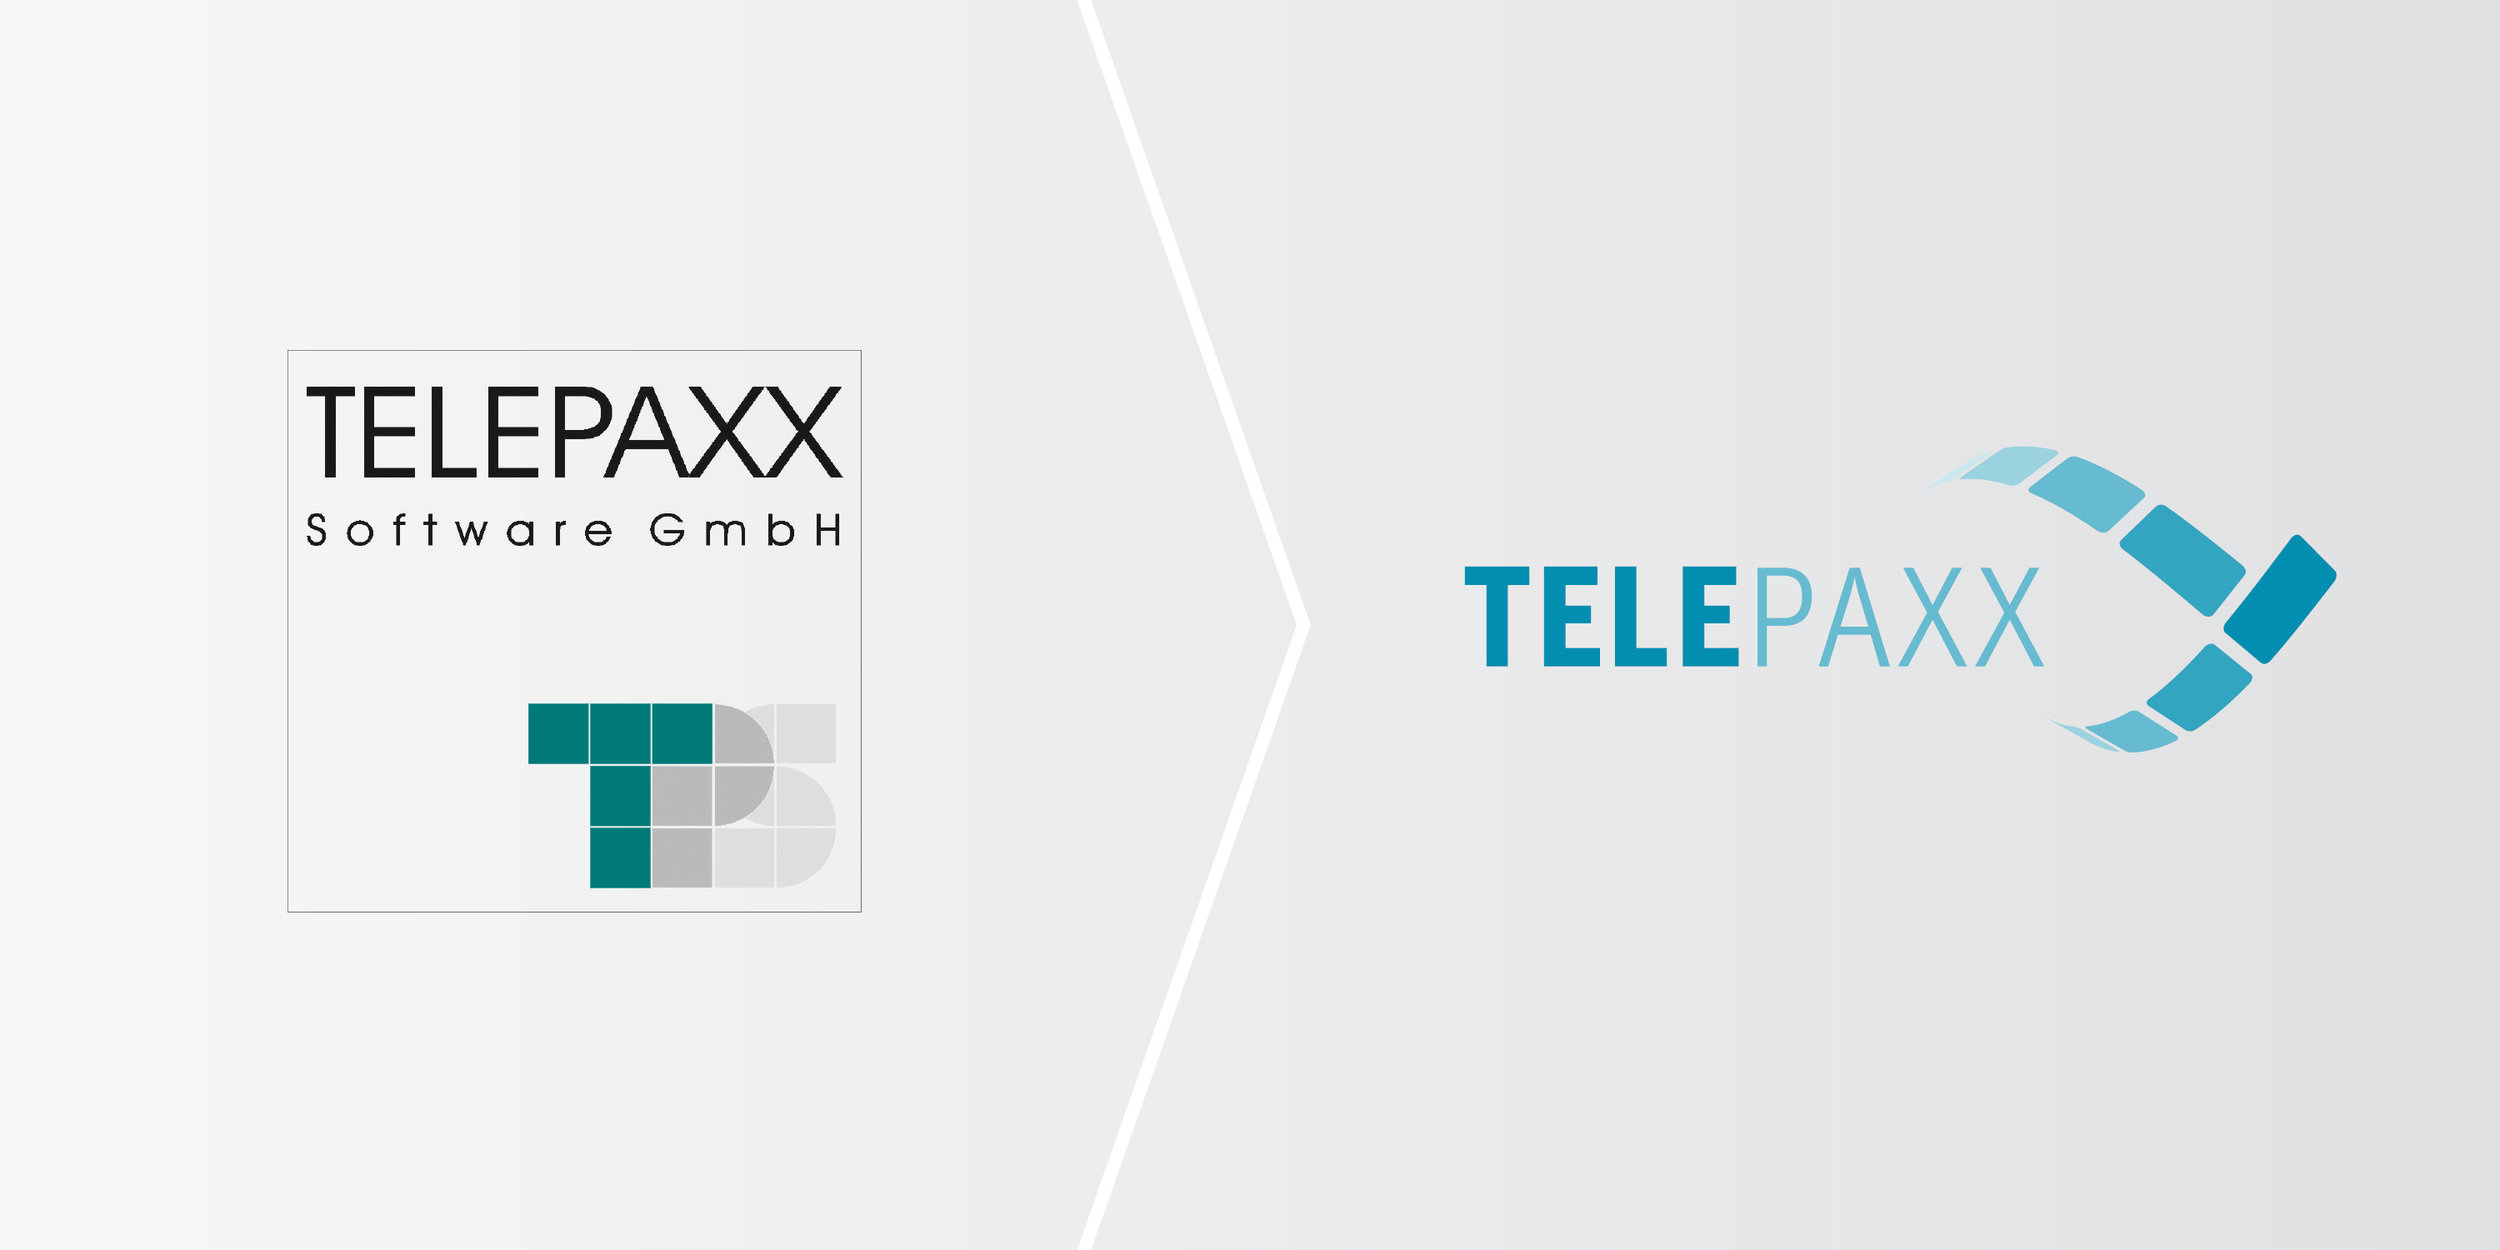 Telepaxx Logo Redesign 02.jpg